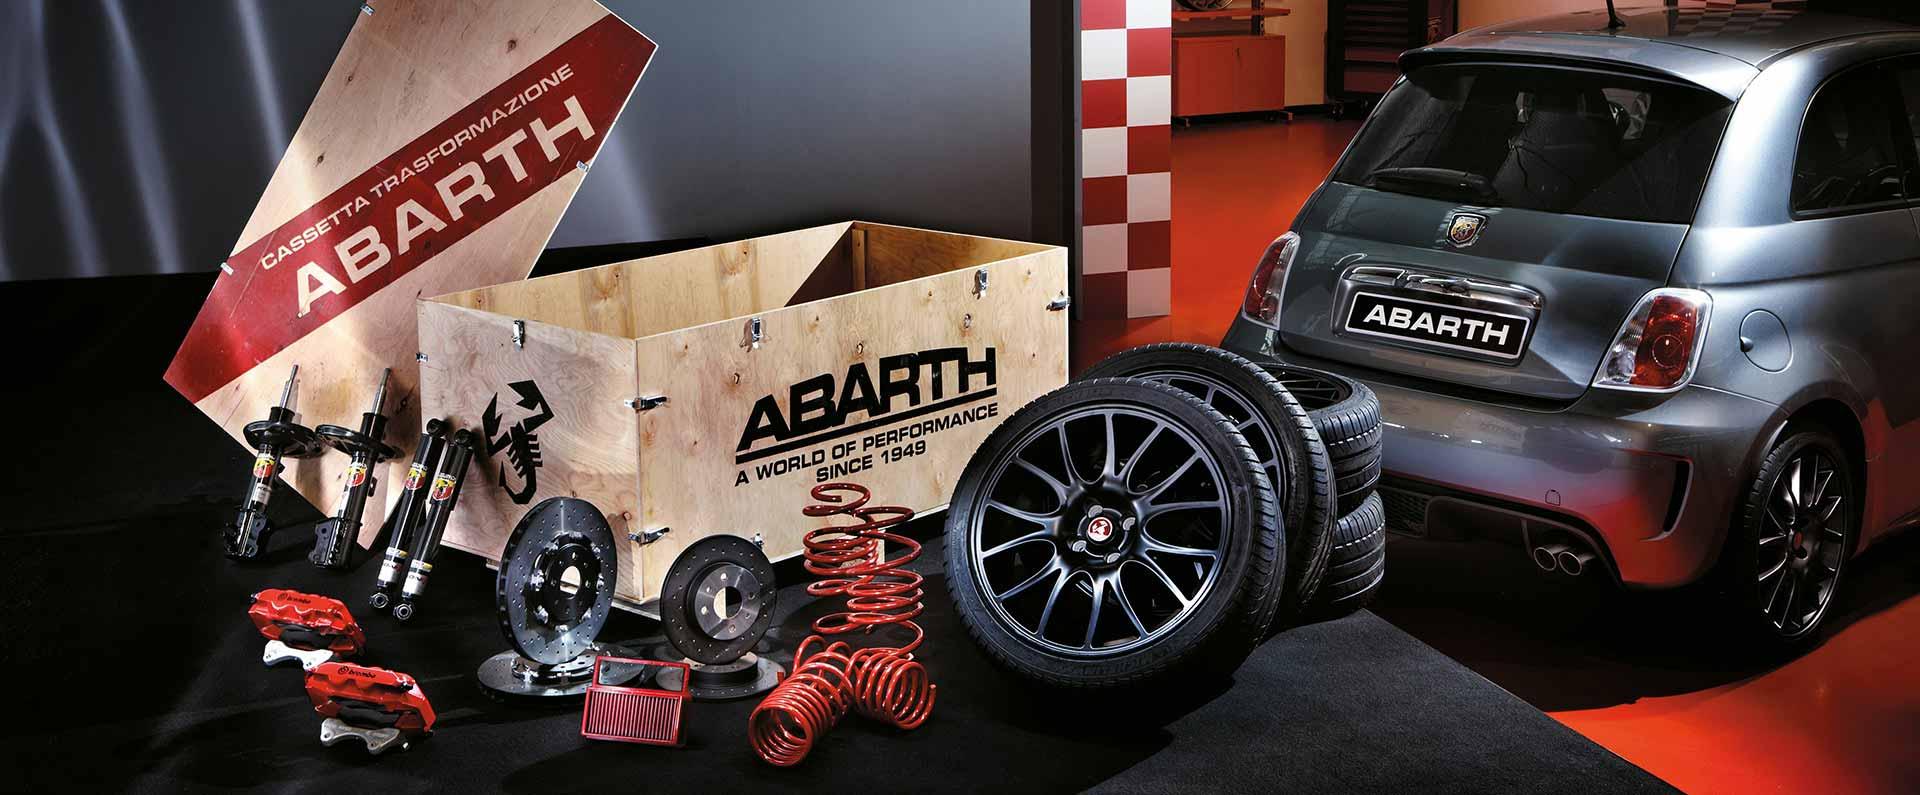 Abarth Cars UK | Esseesse Rim Car Tuning Kit